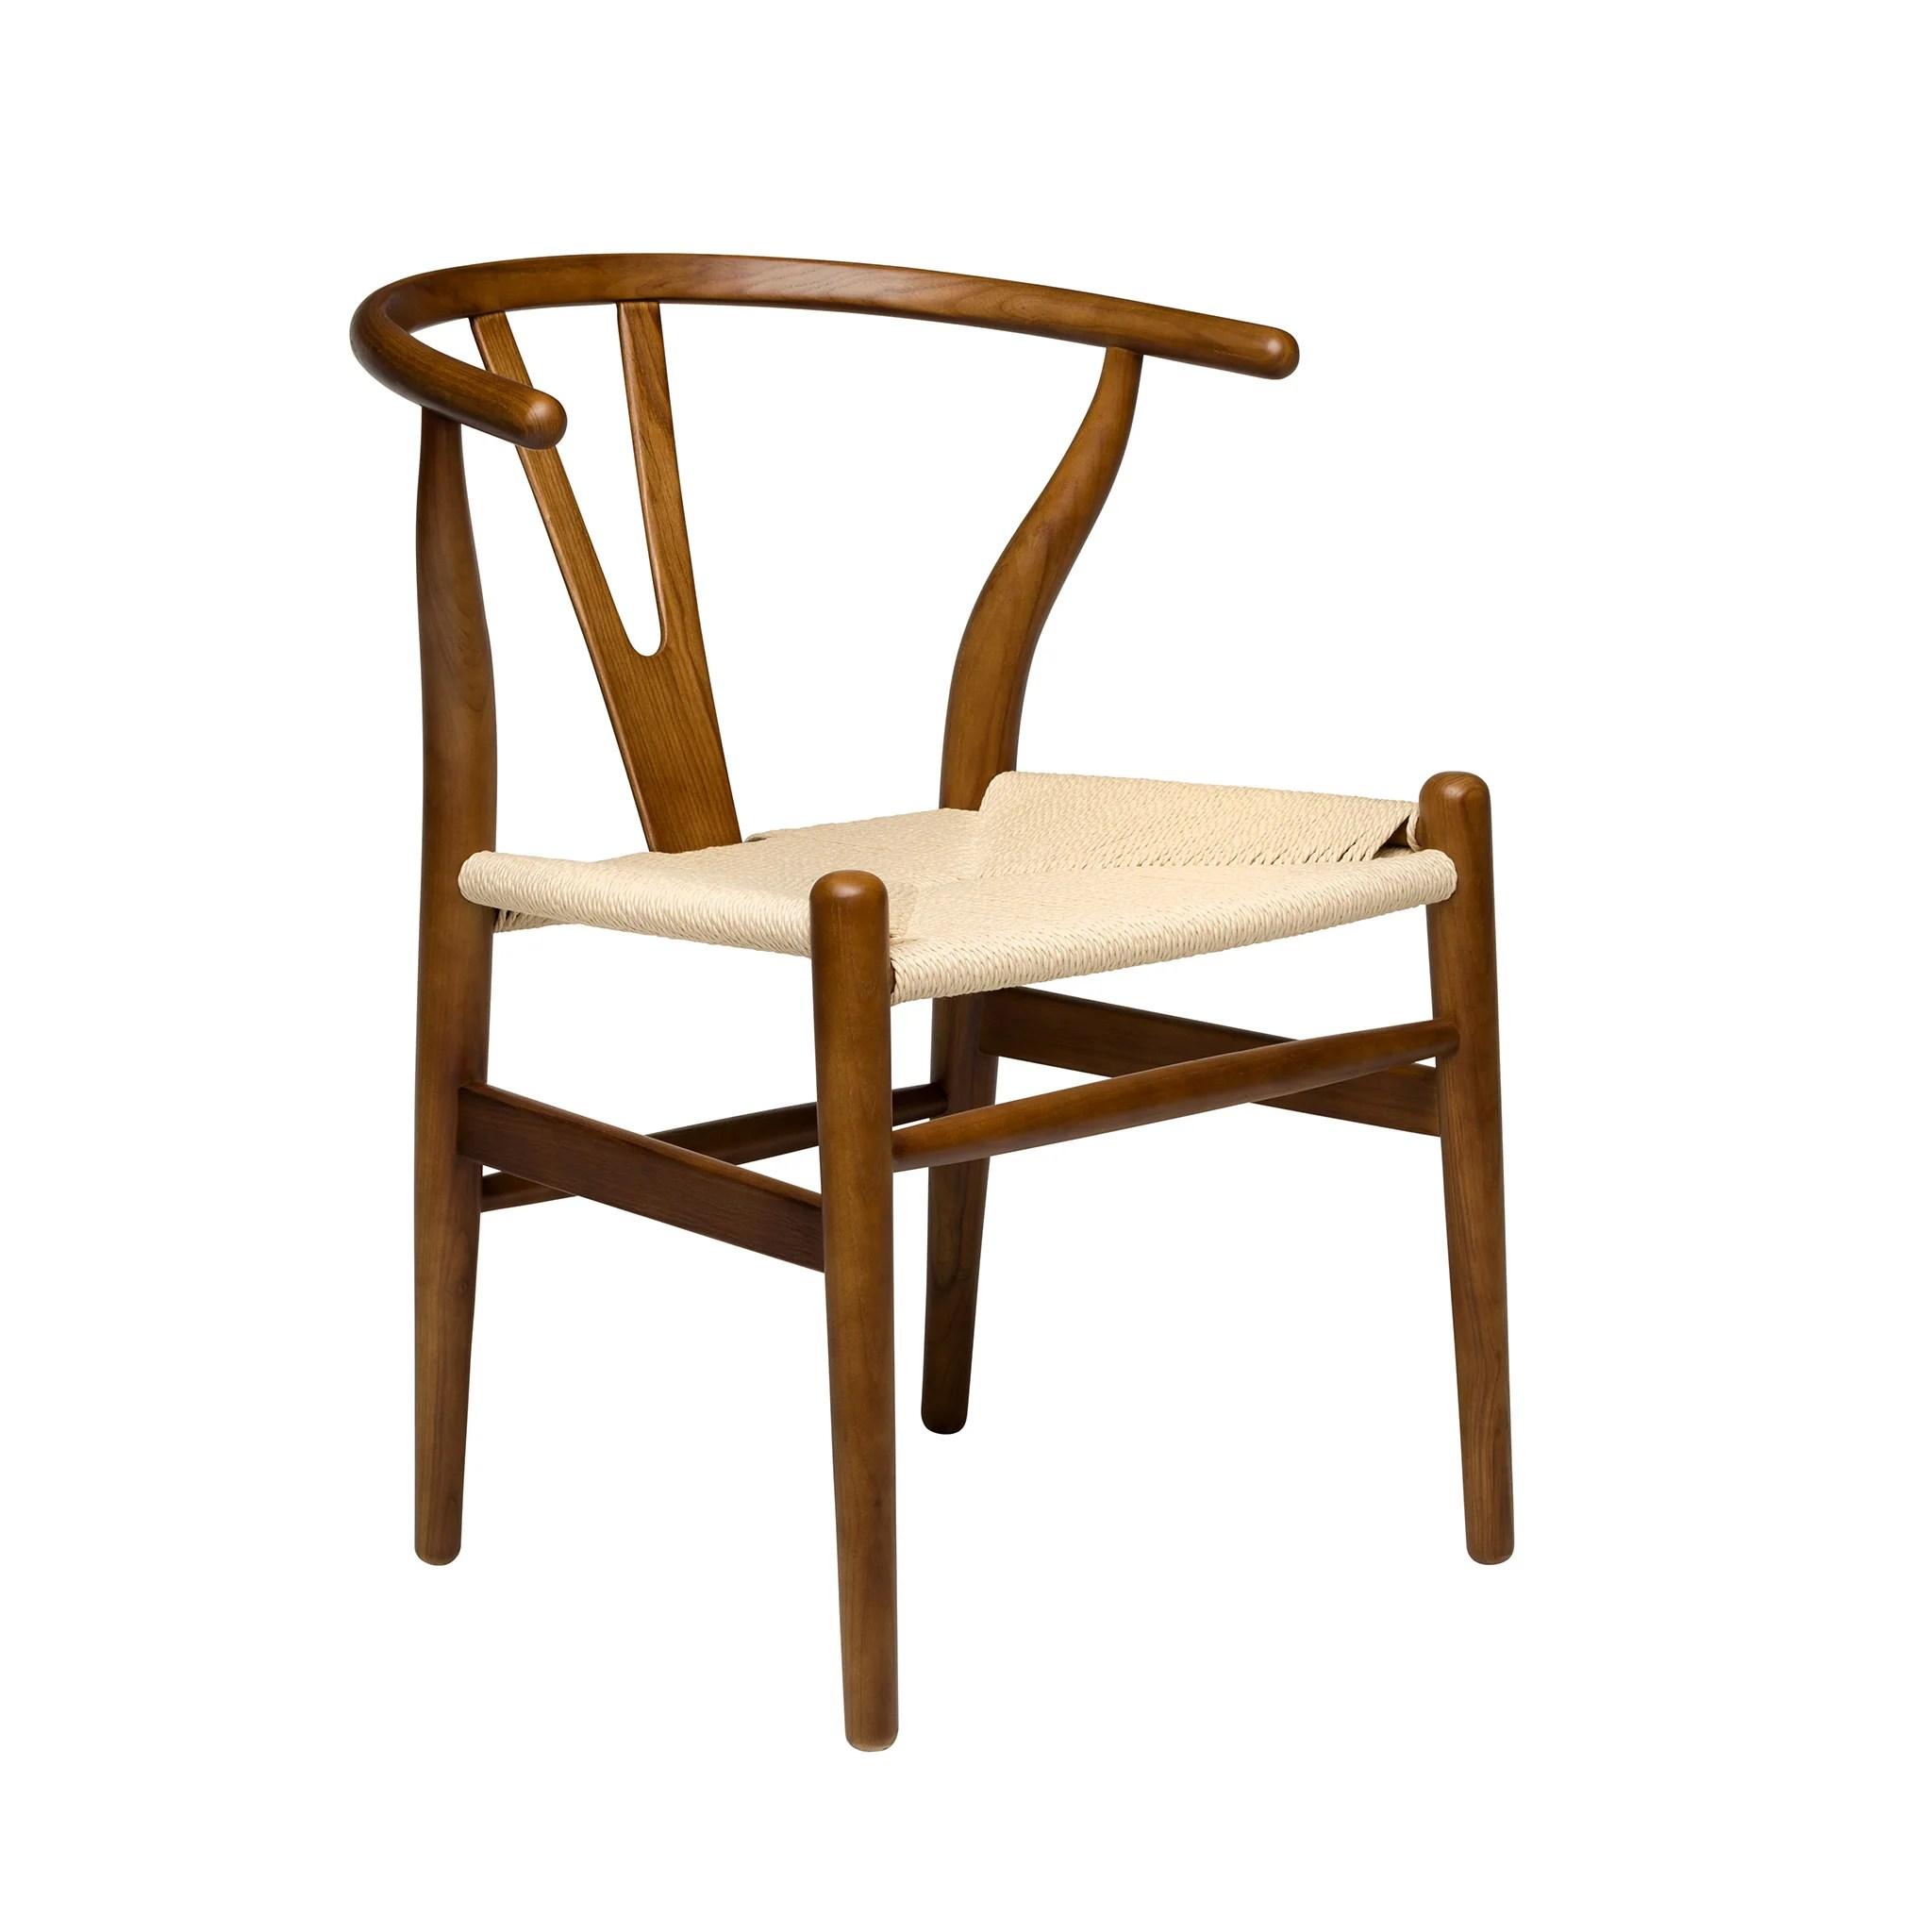 wishbone chairs morris chair cushions walnut natural woven cord